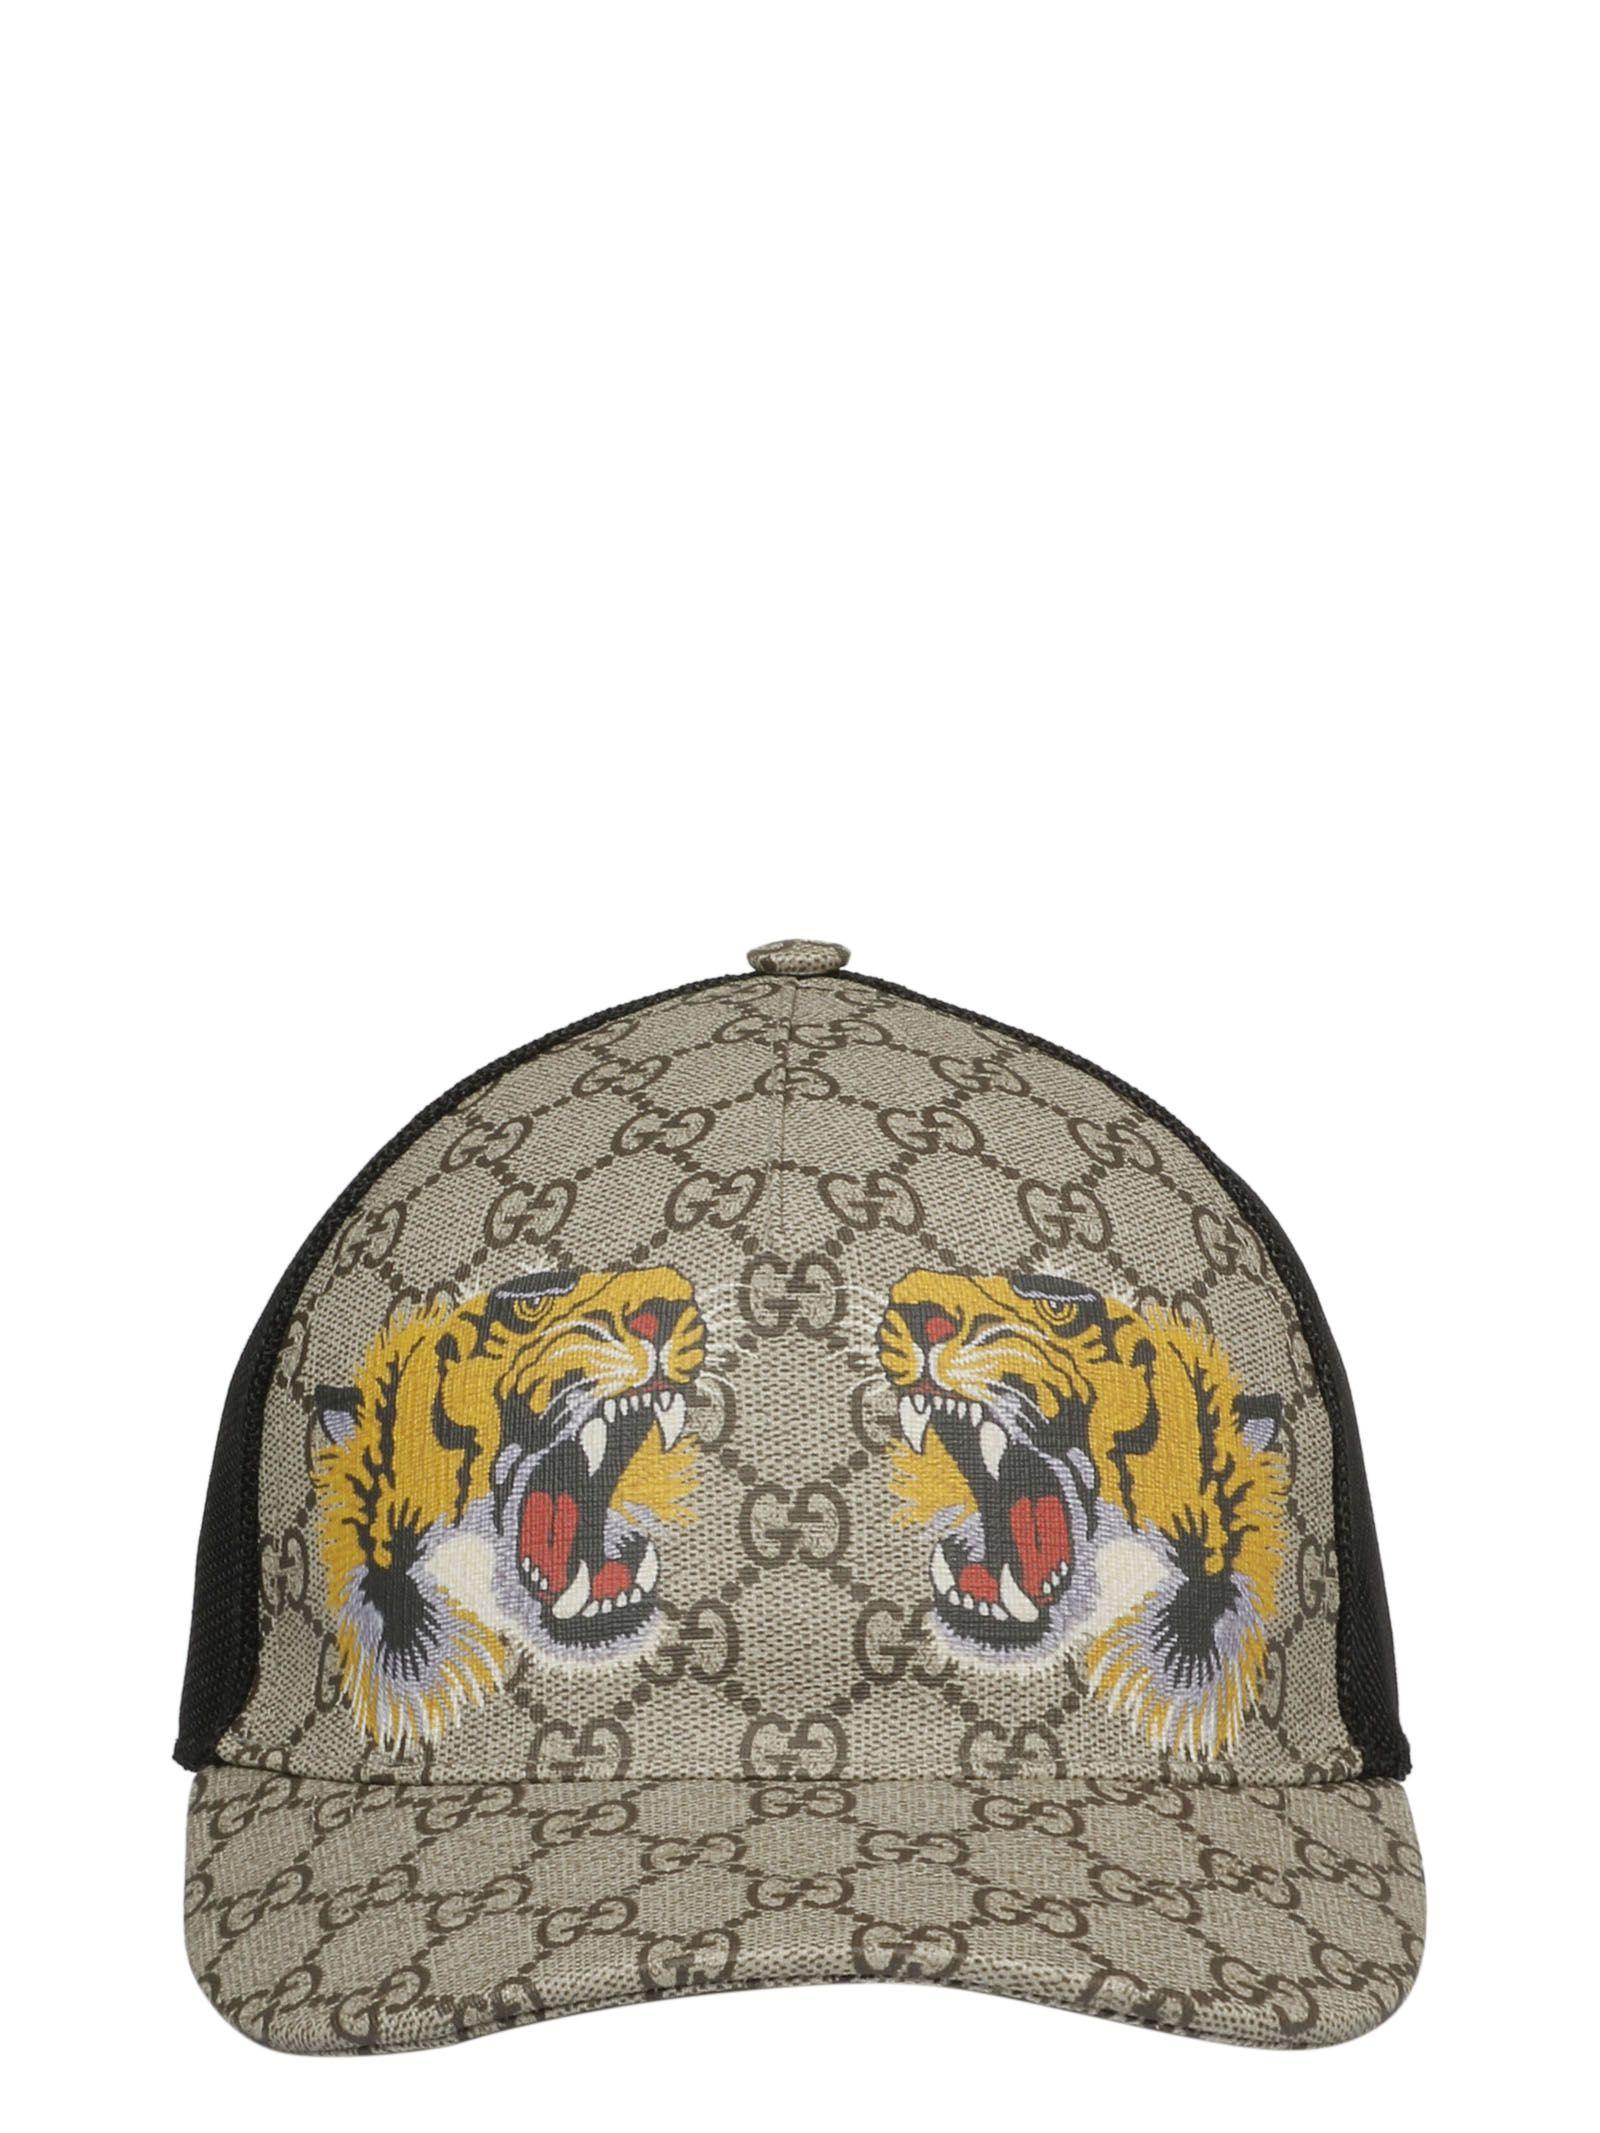 Gucci Gg Supreme Tiger Baseball Cap In 2160  90b1c1d1862